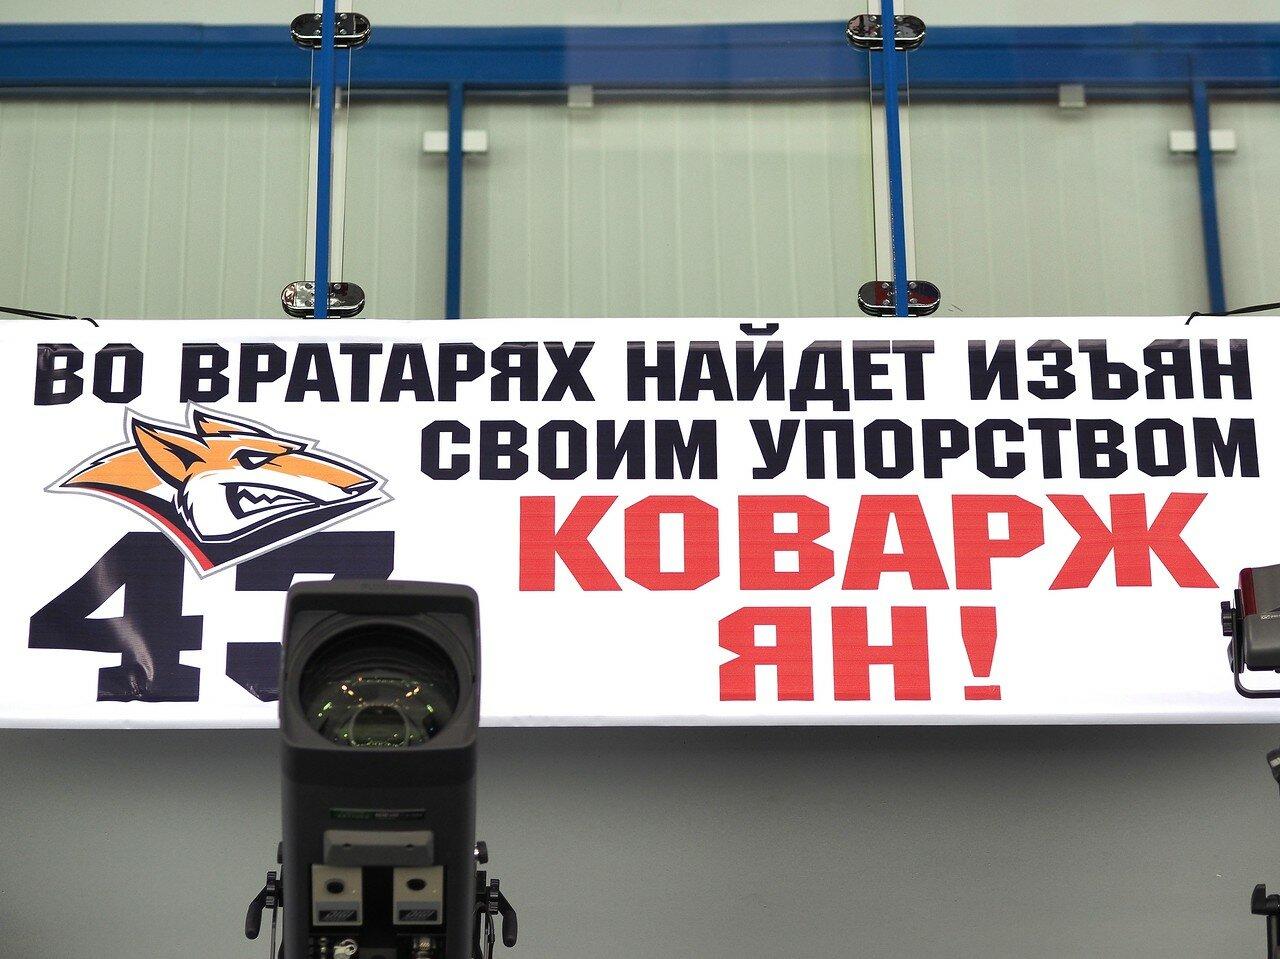 150Восток 1/2 плей-офф Металлург - Сибирь 08.03.2016